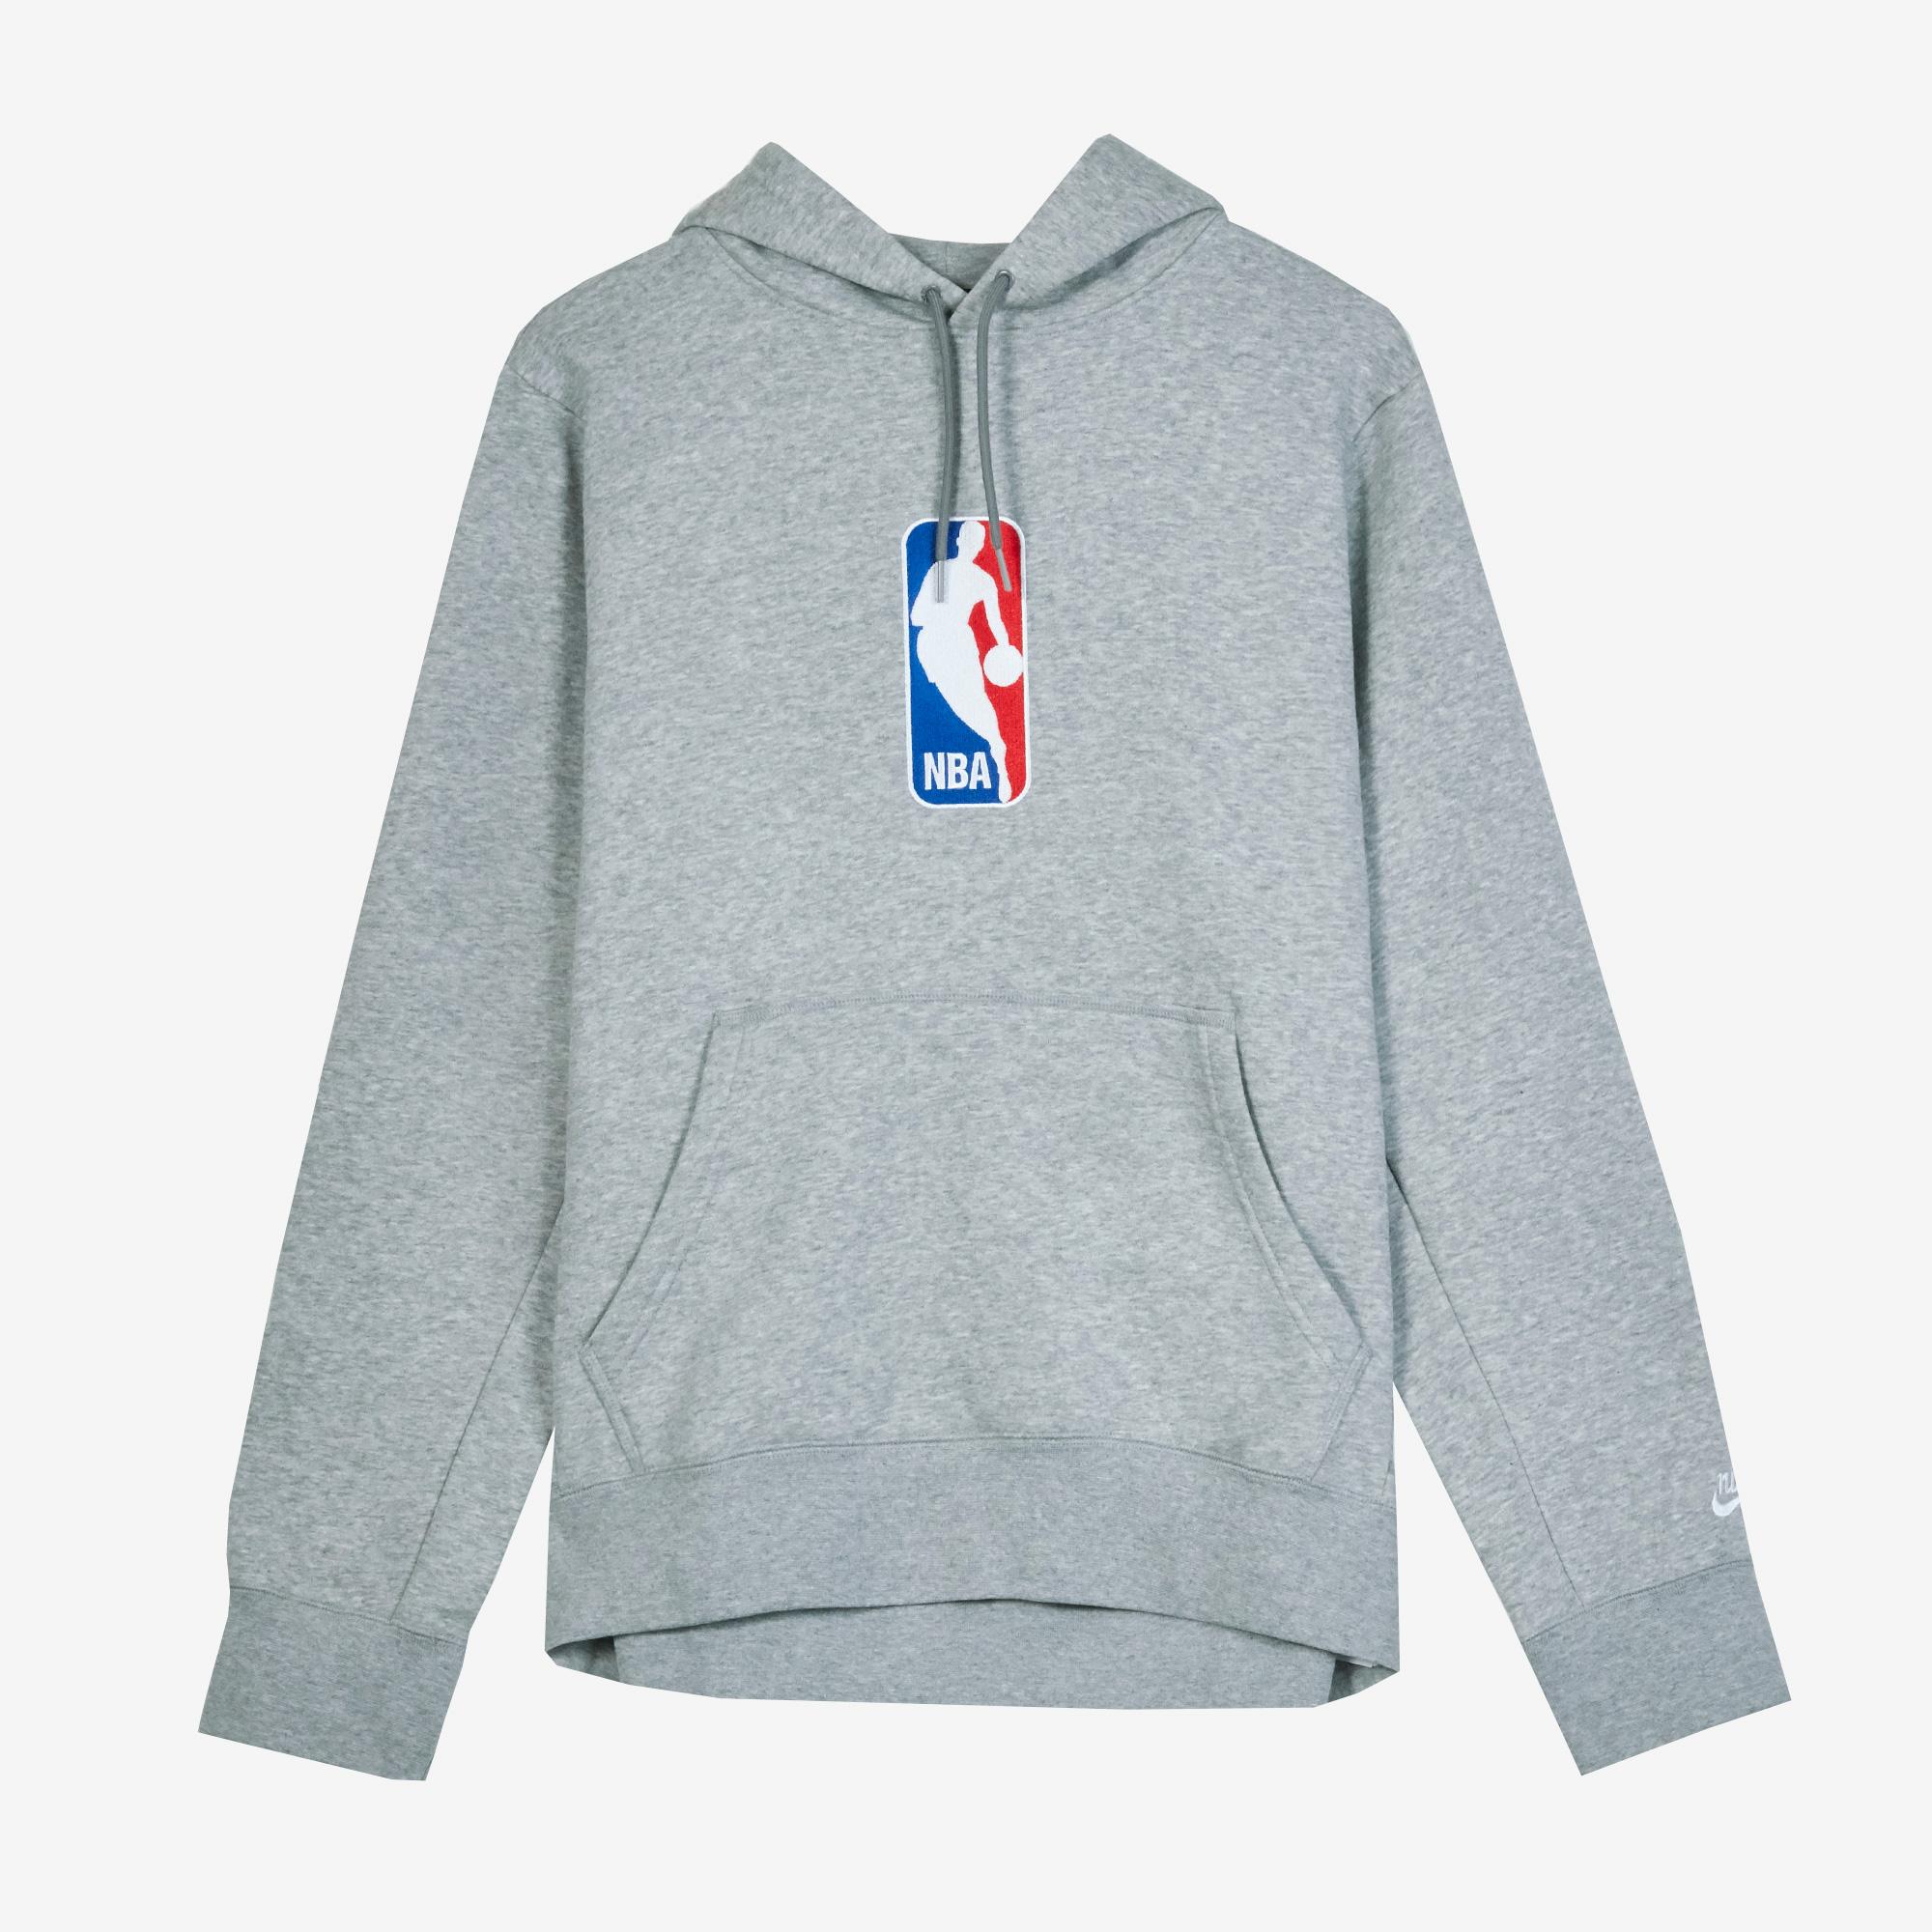 125e4335bc3fd1 Nike SB x NBA Hoodie Icon - 938412-063 - Sneakersnstuff